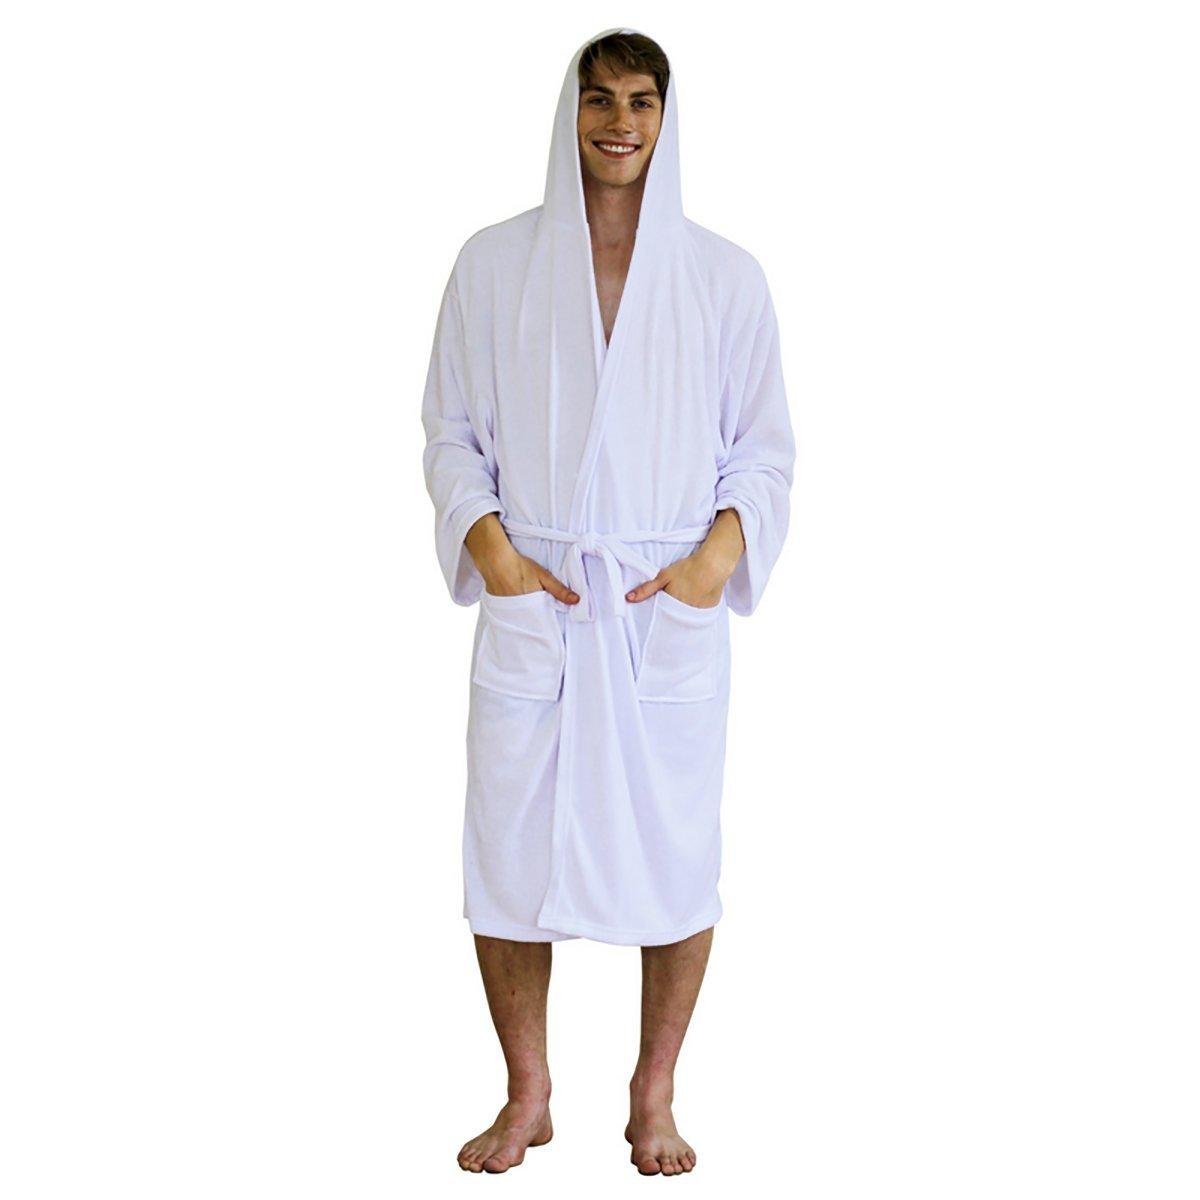 Mens Robe – Hooded Terry Cloth Bath Robe, Lightweight Cotton Shower ...